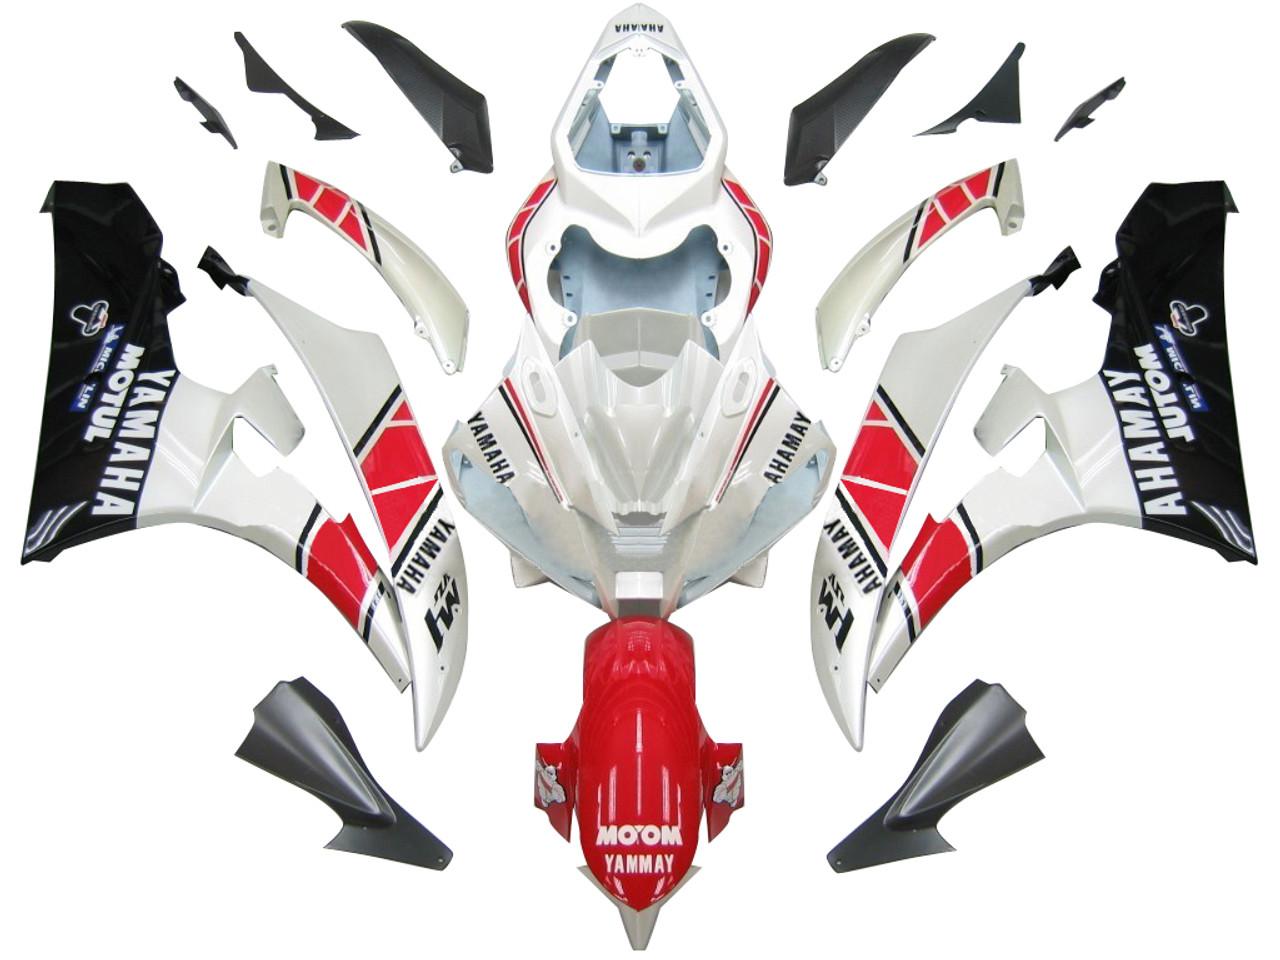 Fairings Yamaha YZF-R6 White Red Black R6 Racing (2006-2007)